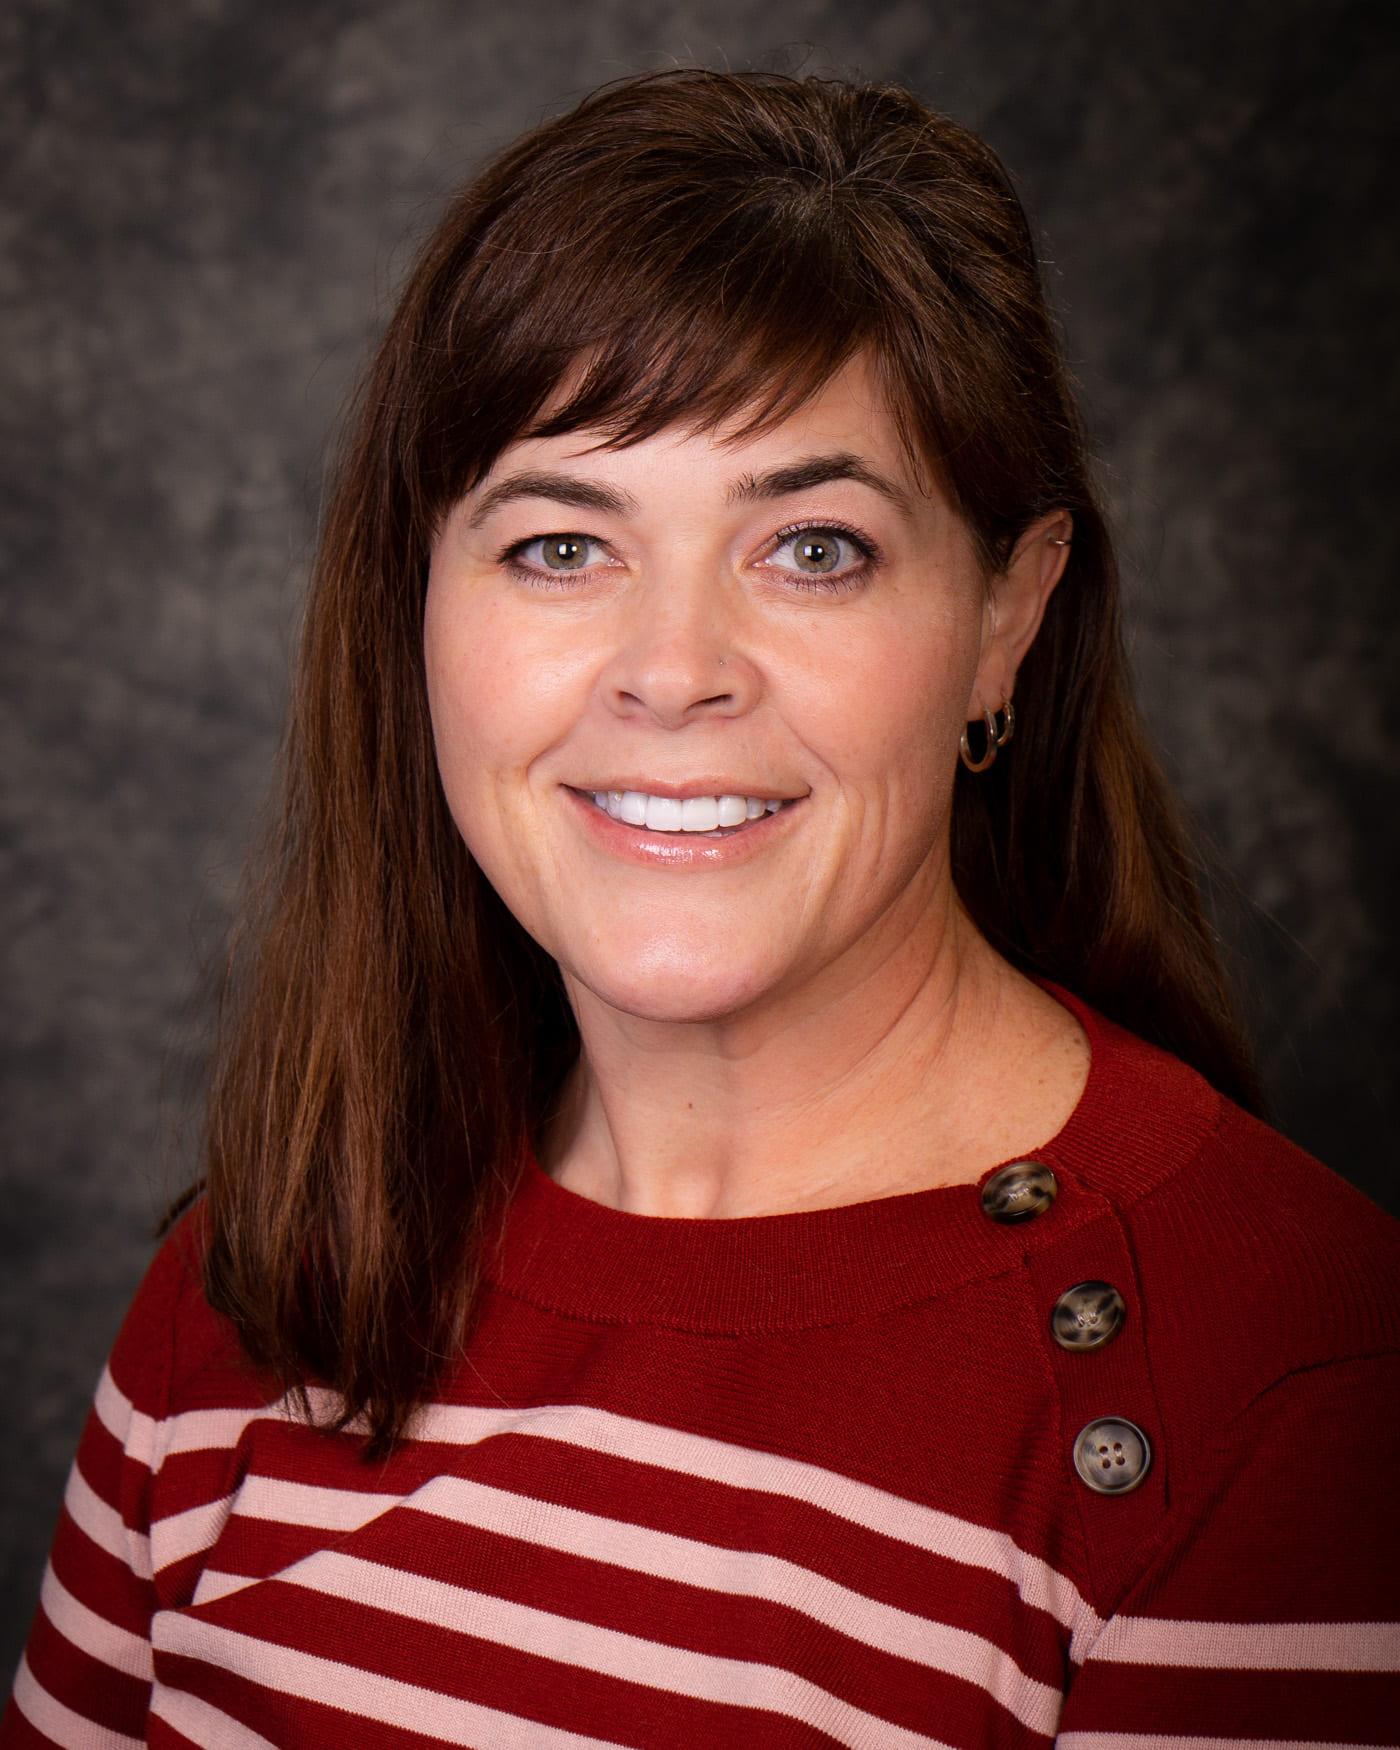 Sarah Wagnone